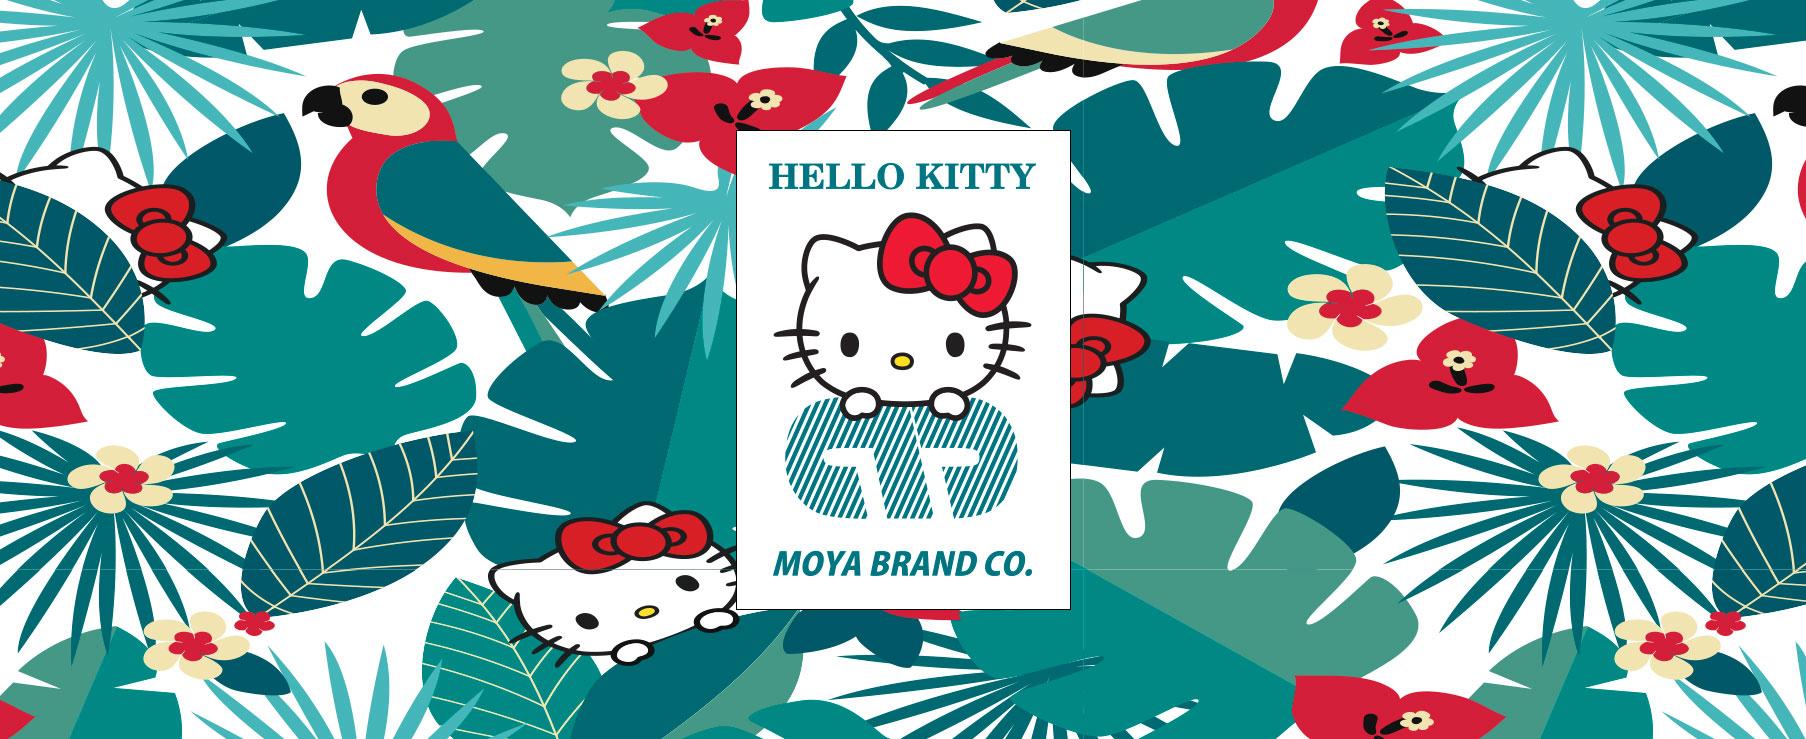 home-hello-kitty-moya-brand-jiu-jitsu-bjj-grappling.jpg